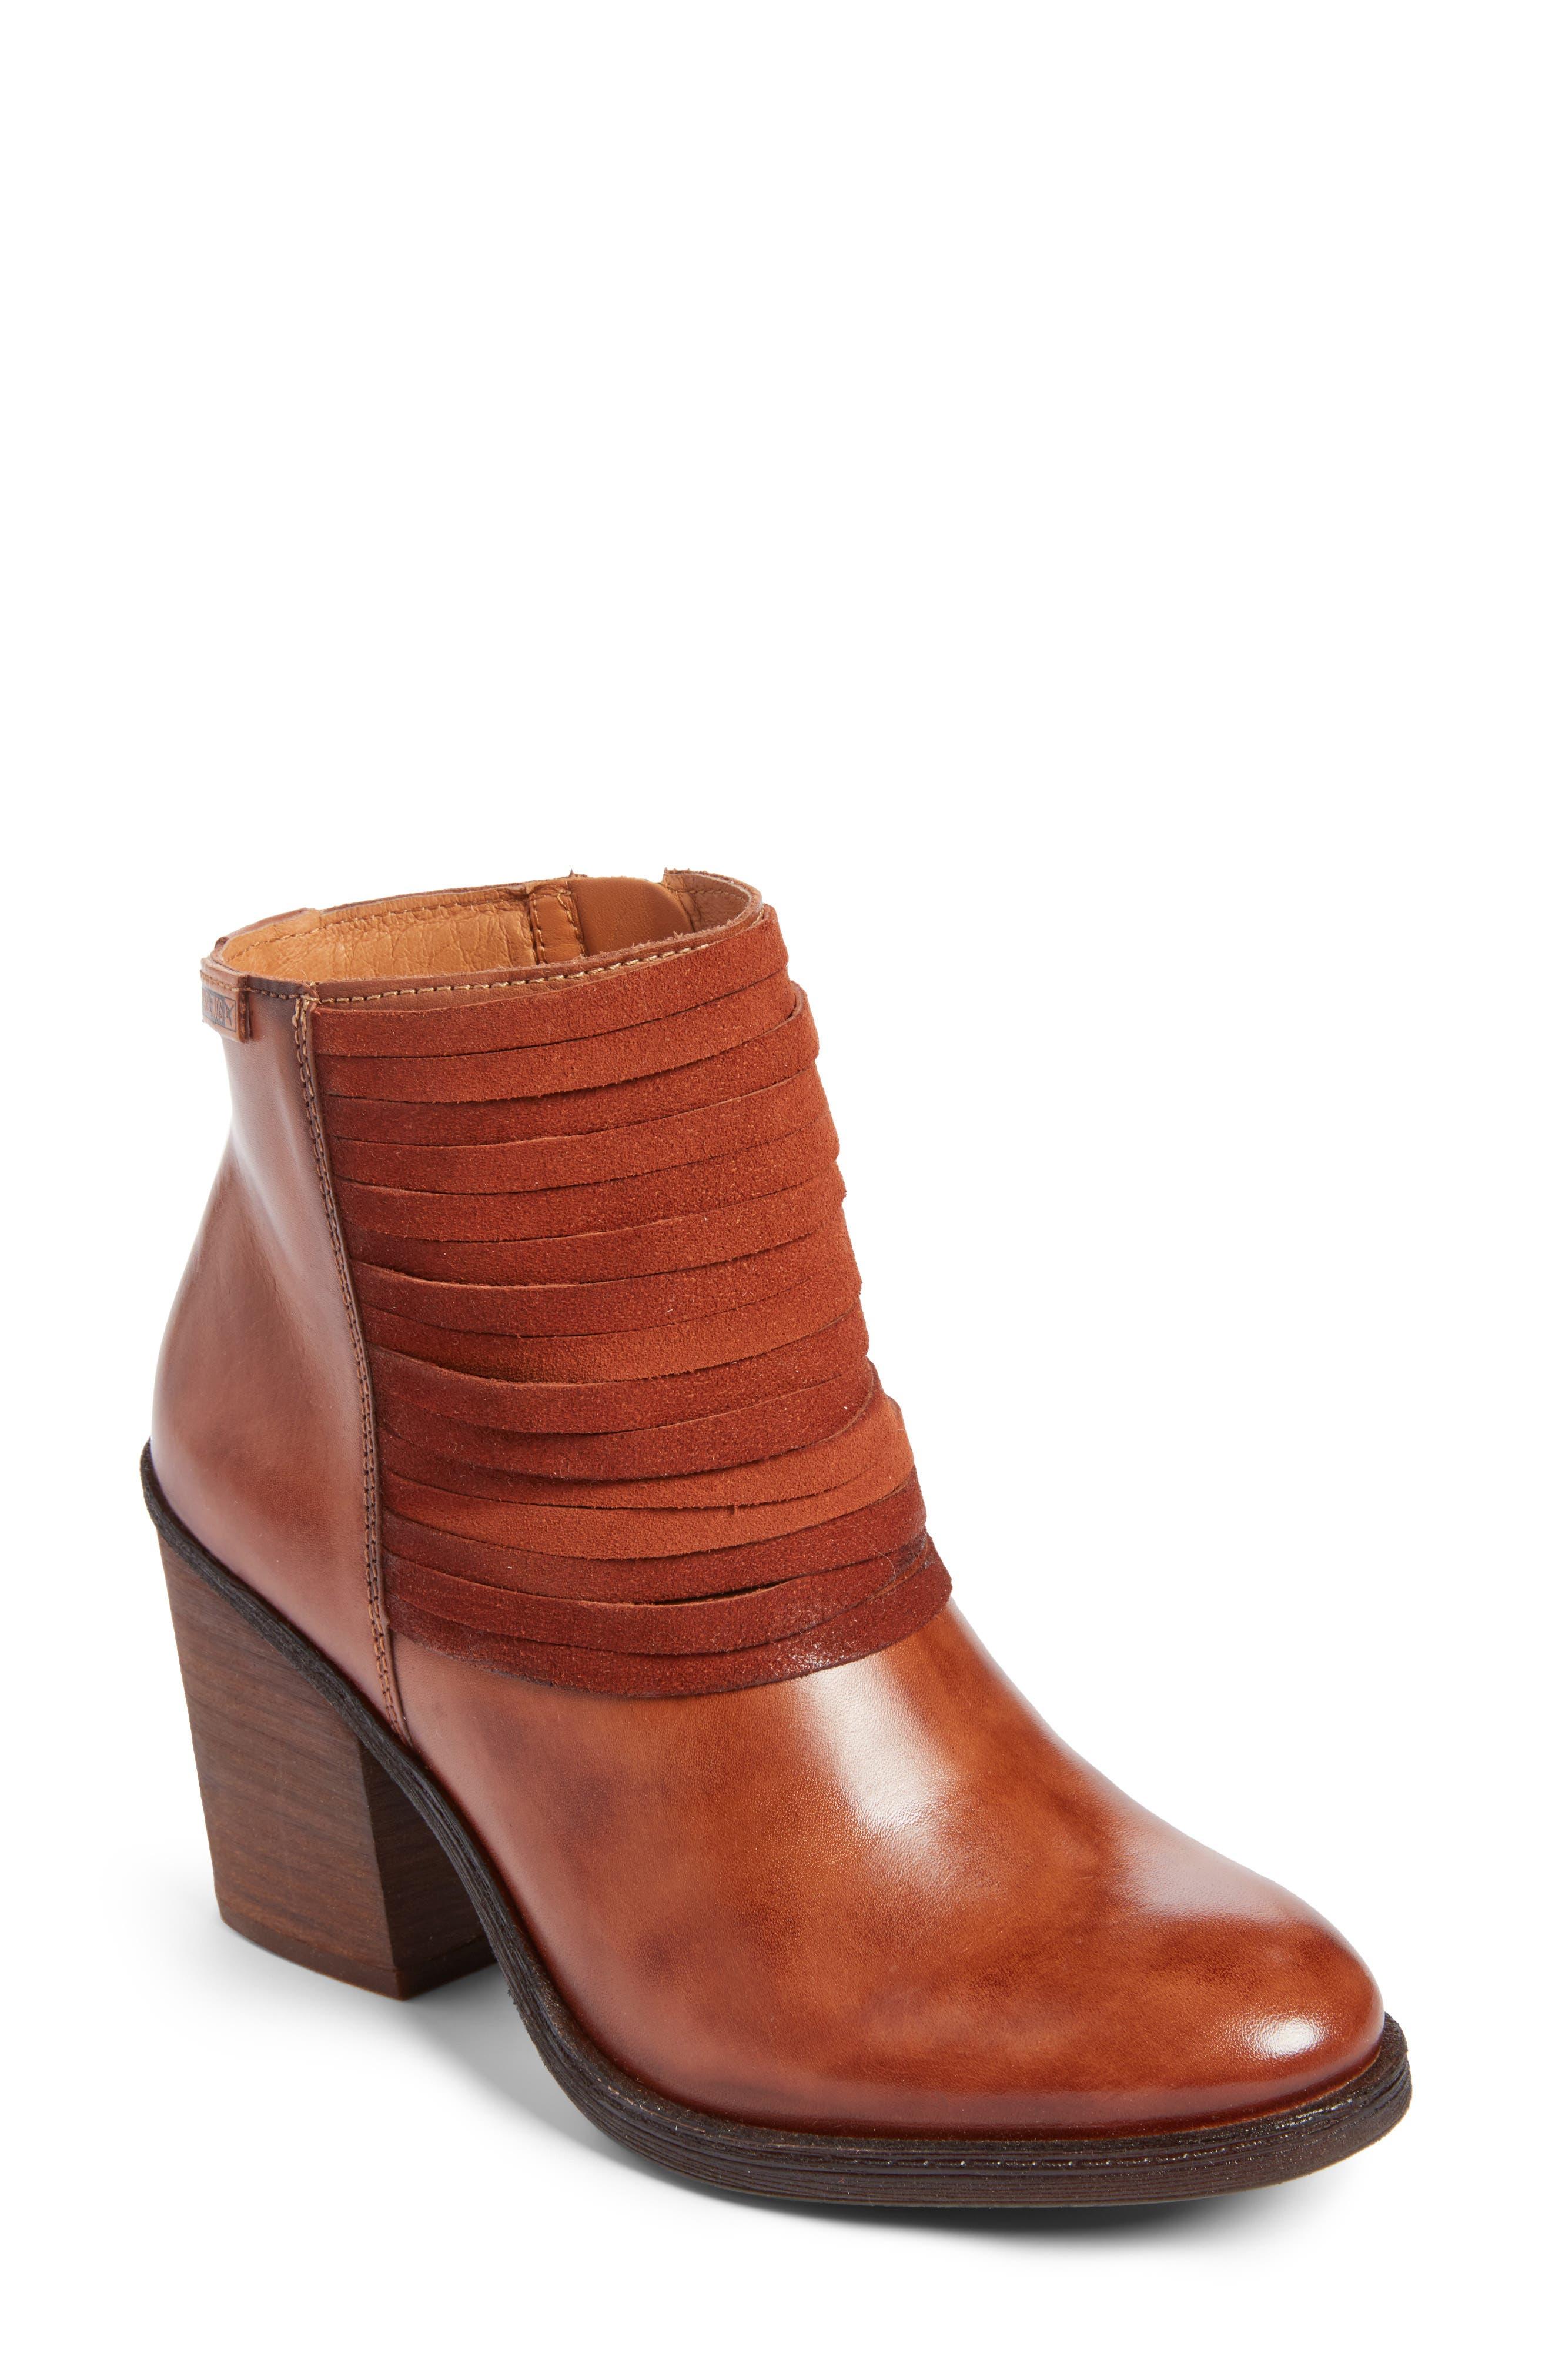 Alicante Bootie,                             Main thumbnail 1, color,                             Cuero Leather